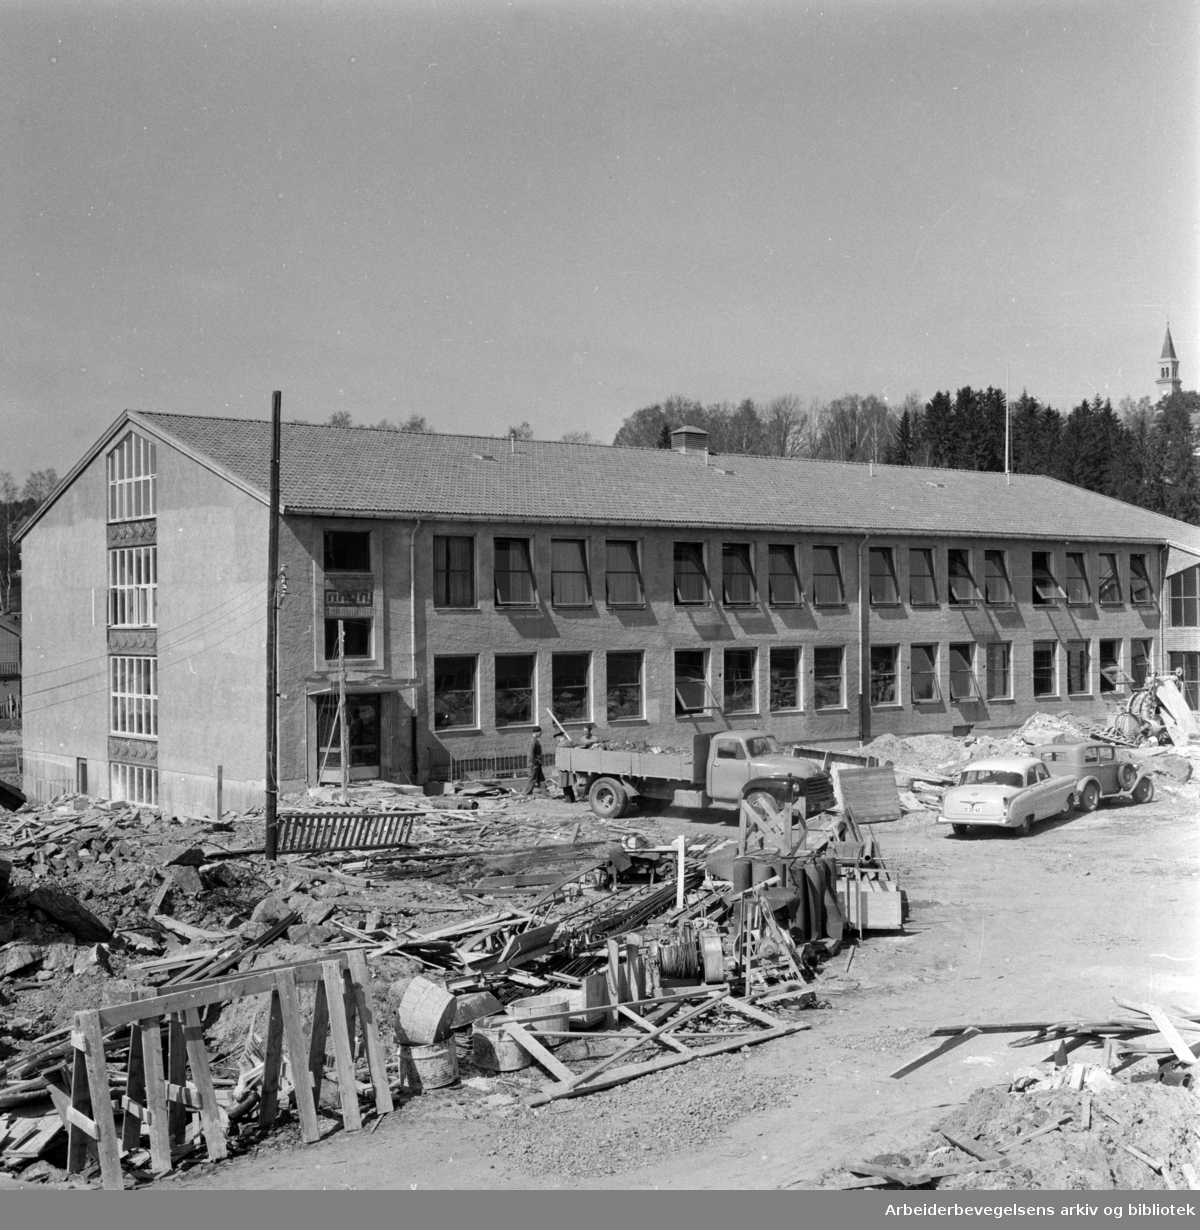 Grorud høgre skole under bygging. Mai 1959